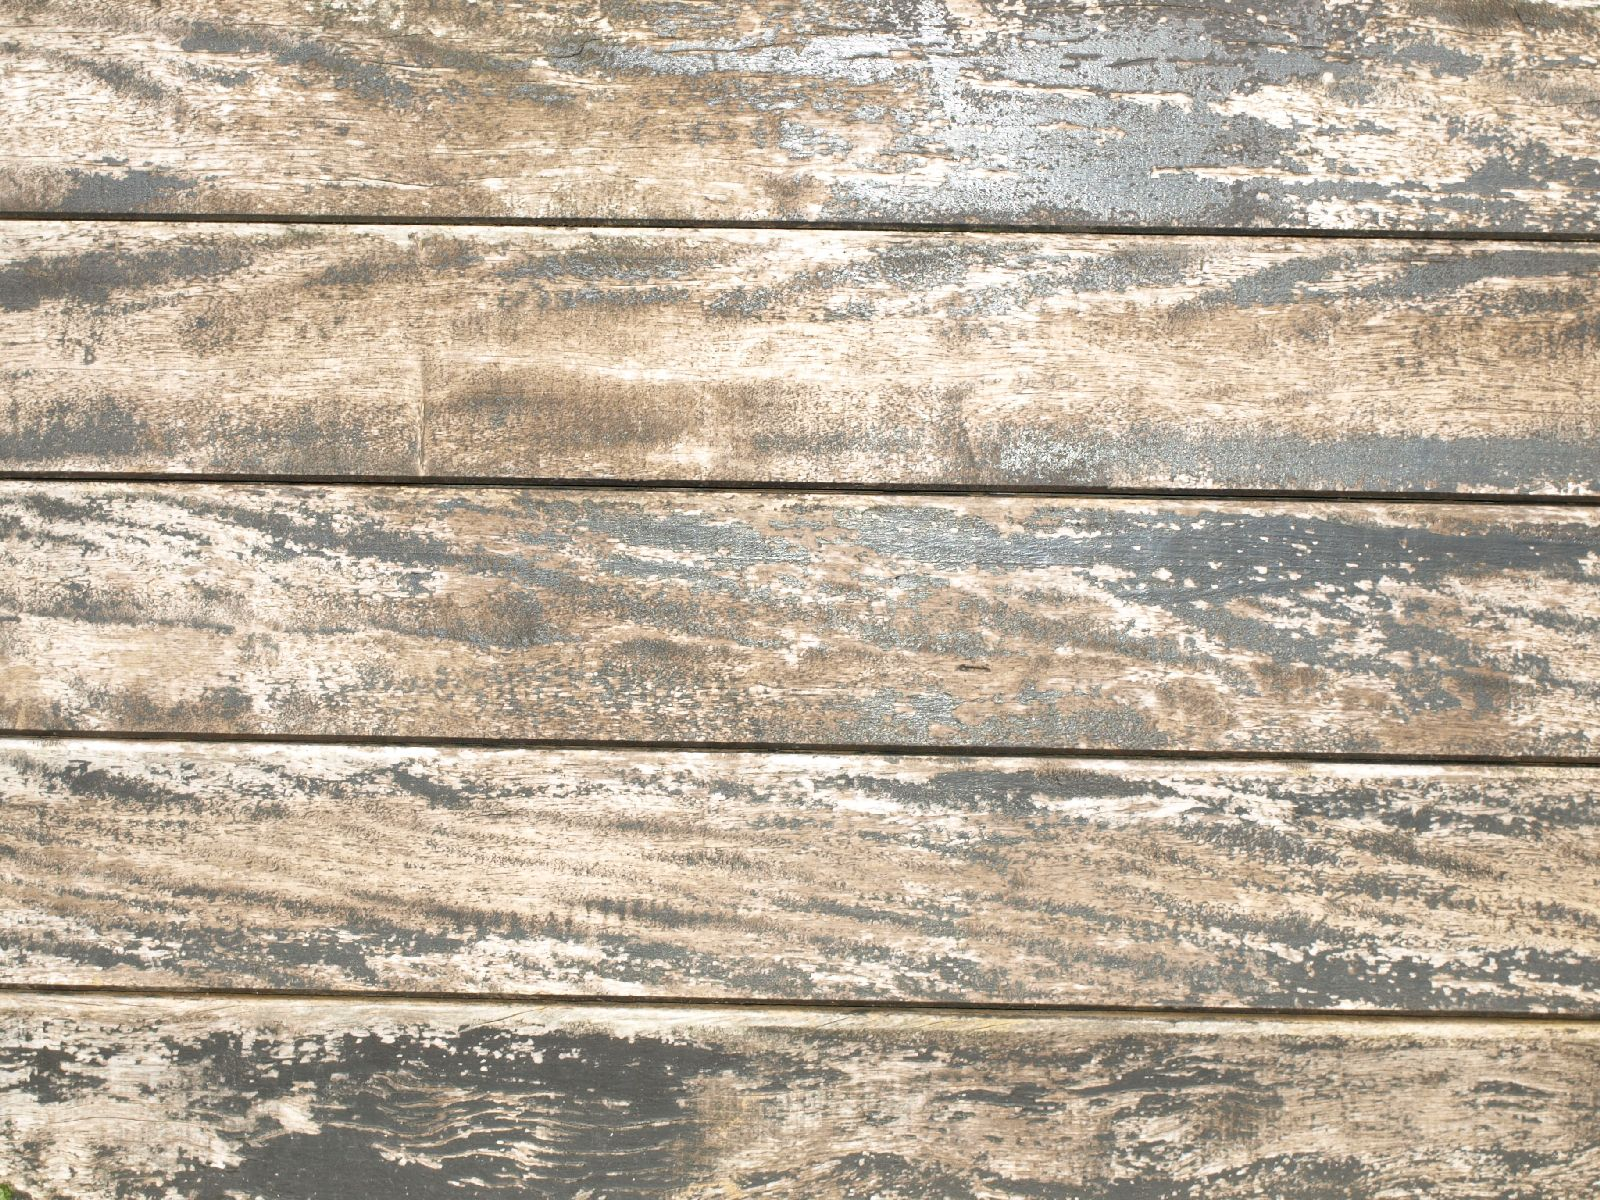 Wood_Texture_A_P4110645